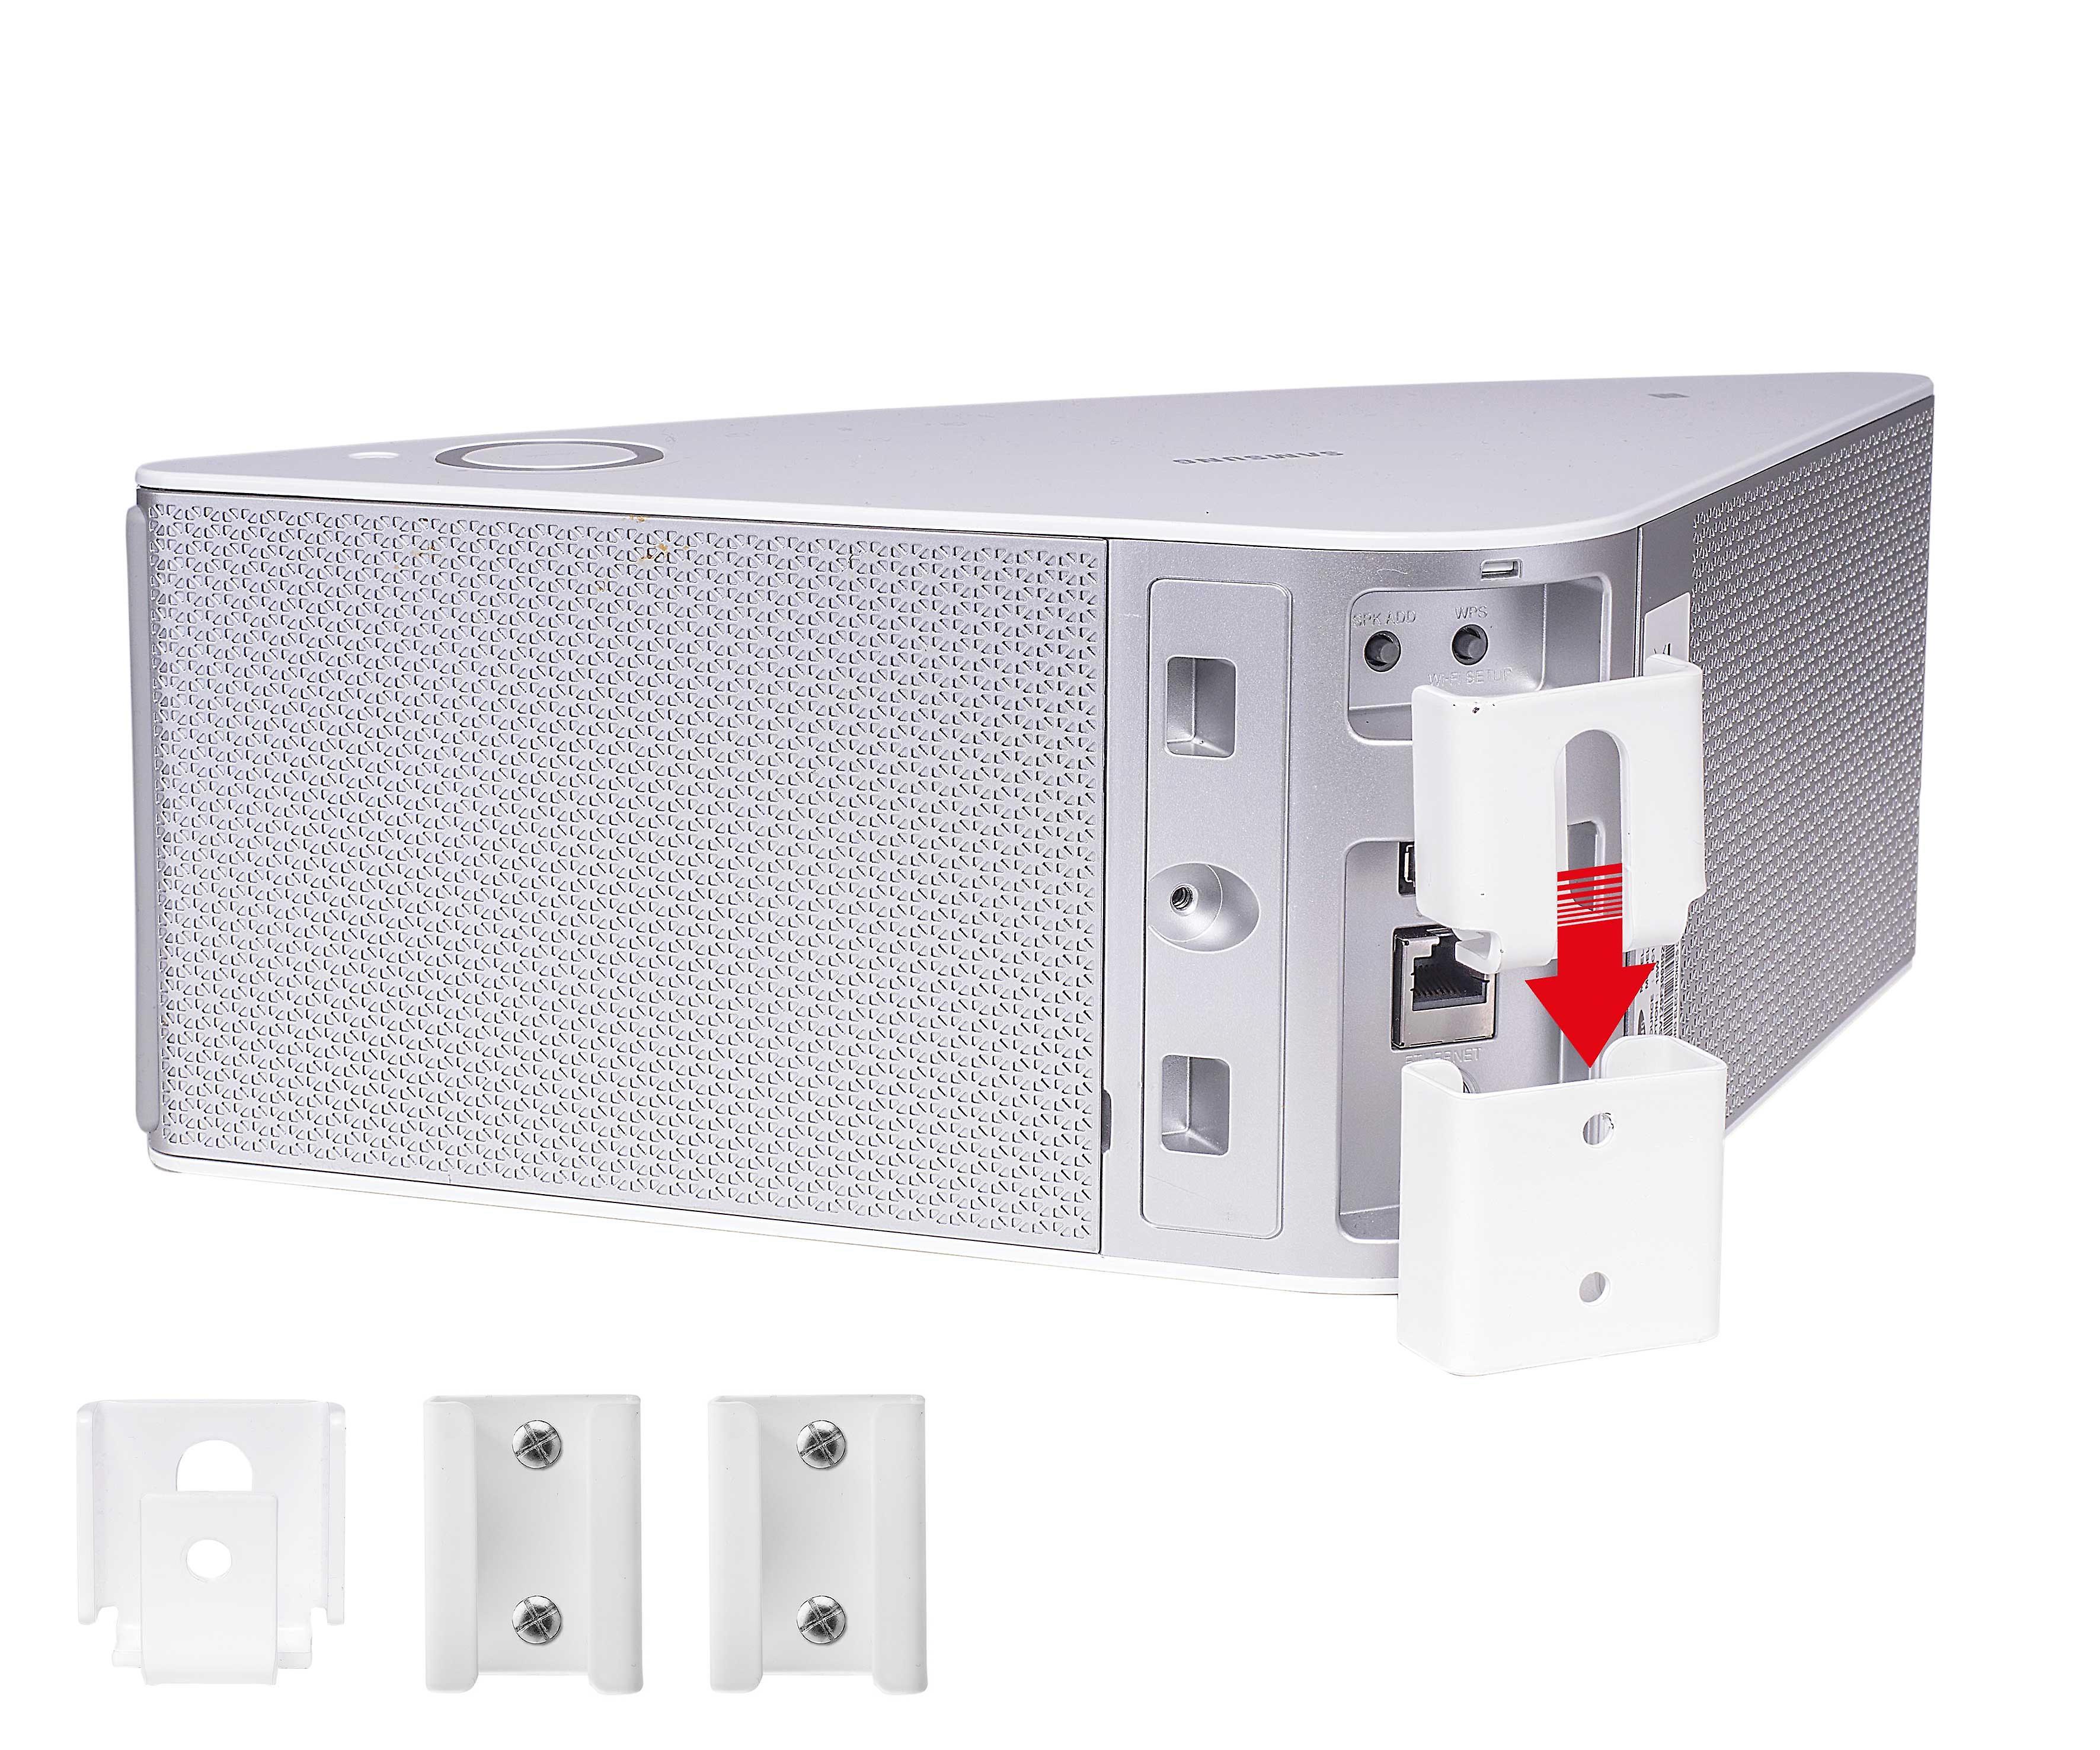 Vebos portable wall mount Samsung M3 WAM351 white